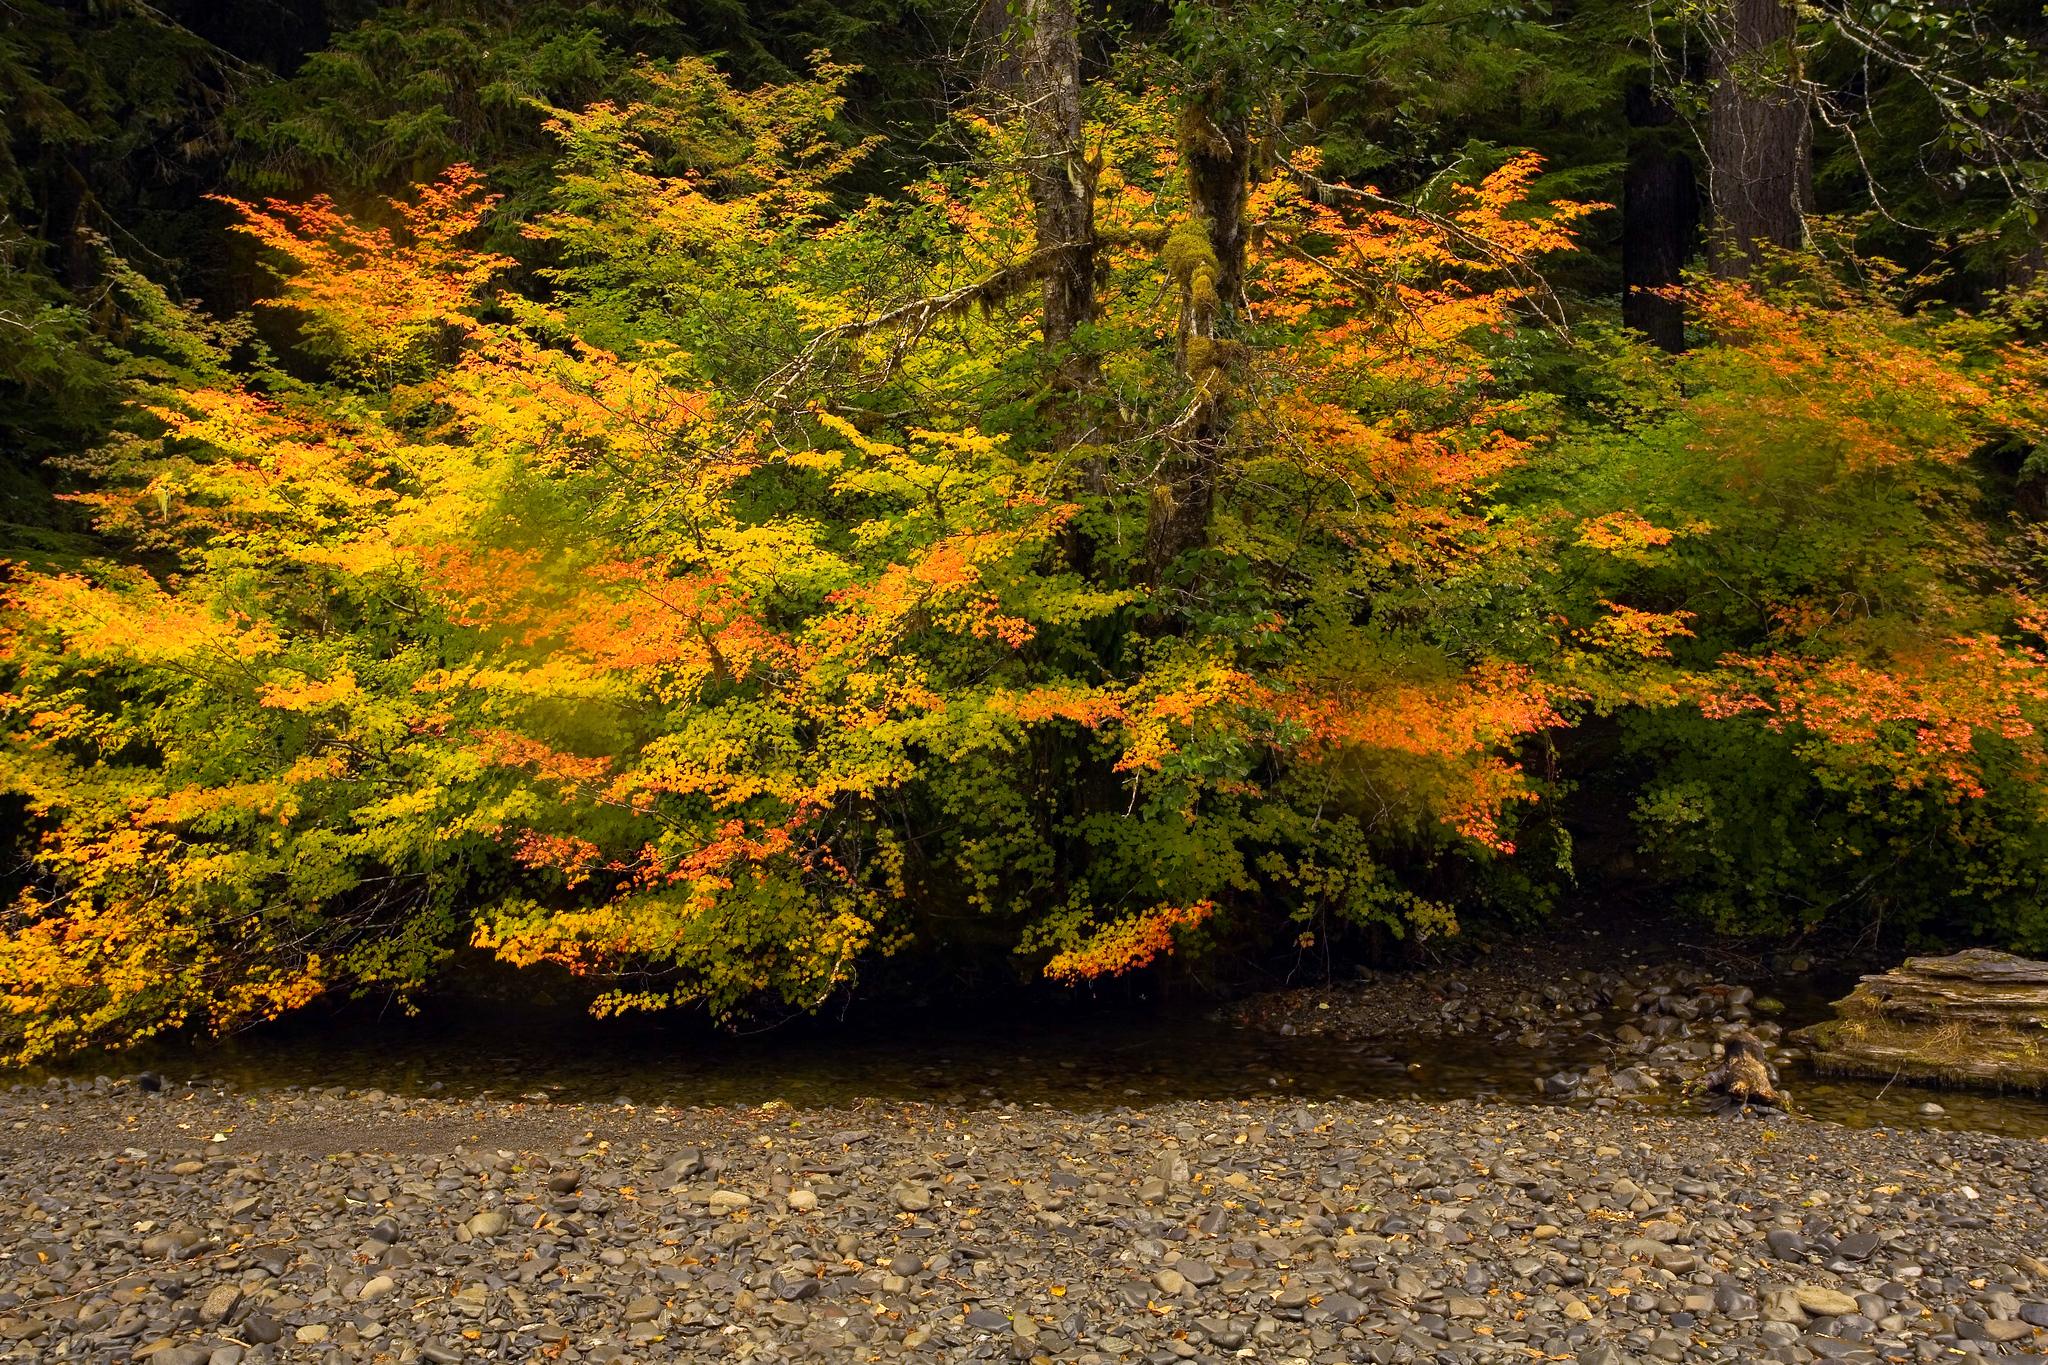 Sol Duc River Vine maple